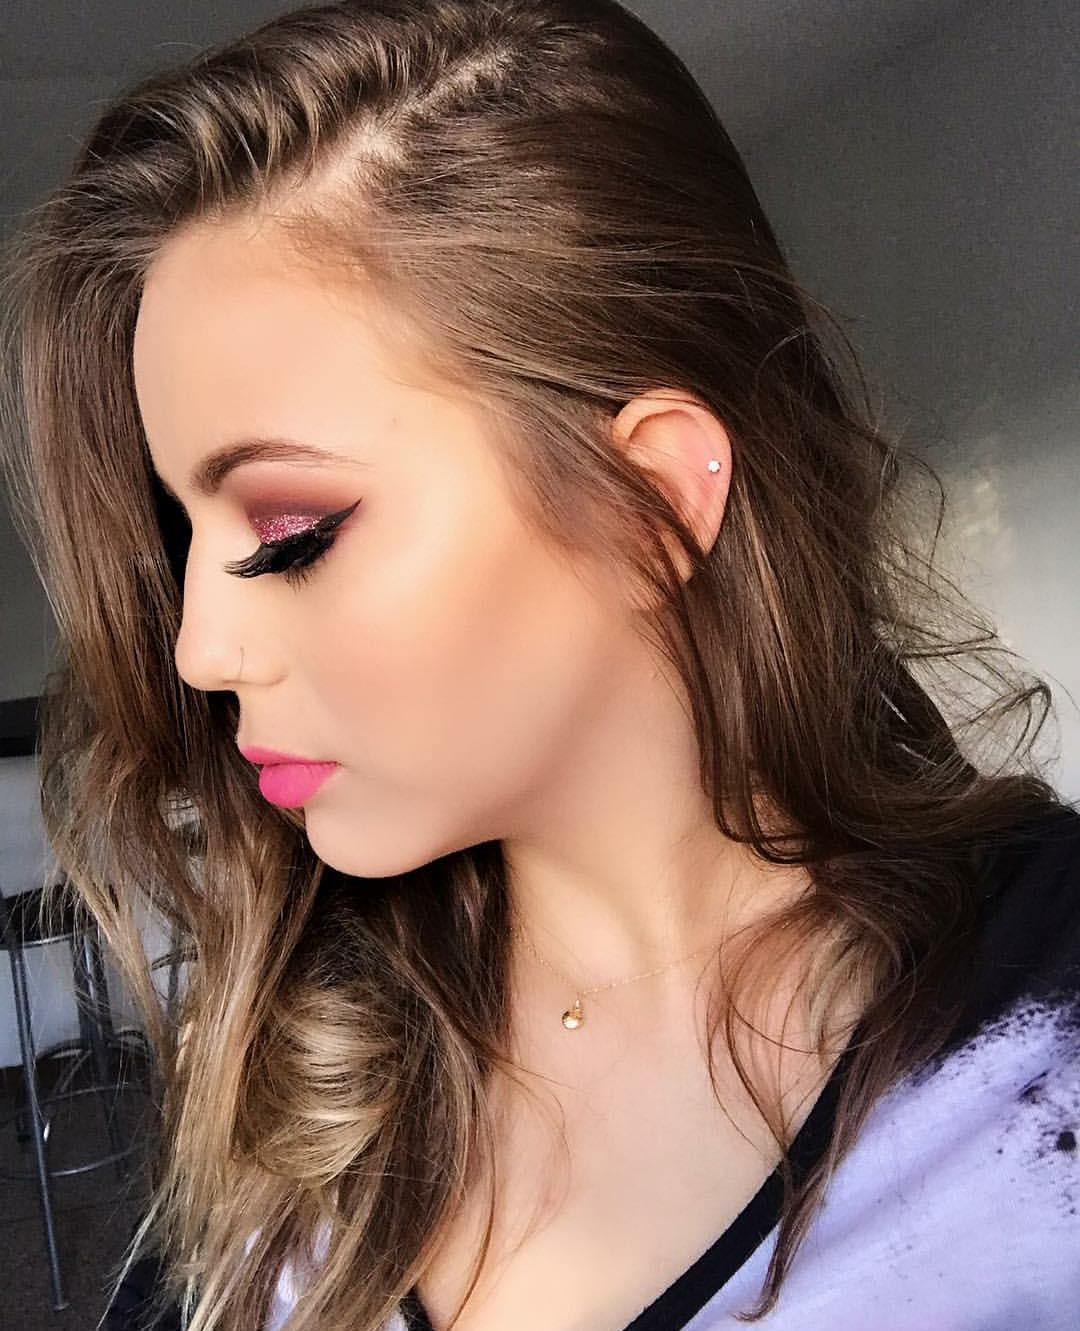 Cut Crease com Glitter maquiagem maquiador(a) consultor(a) designer de sobrancelhas